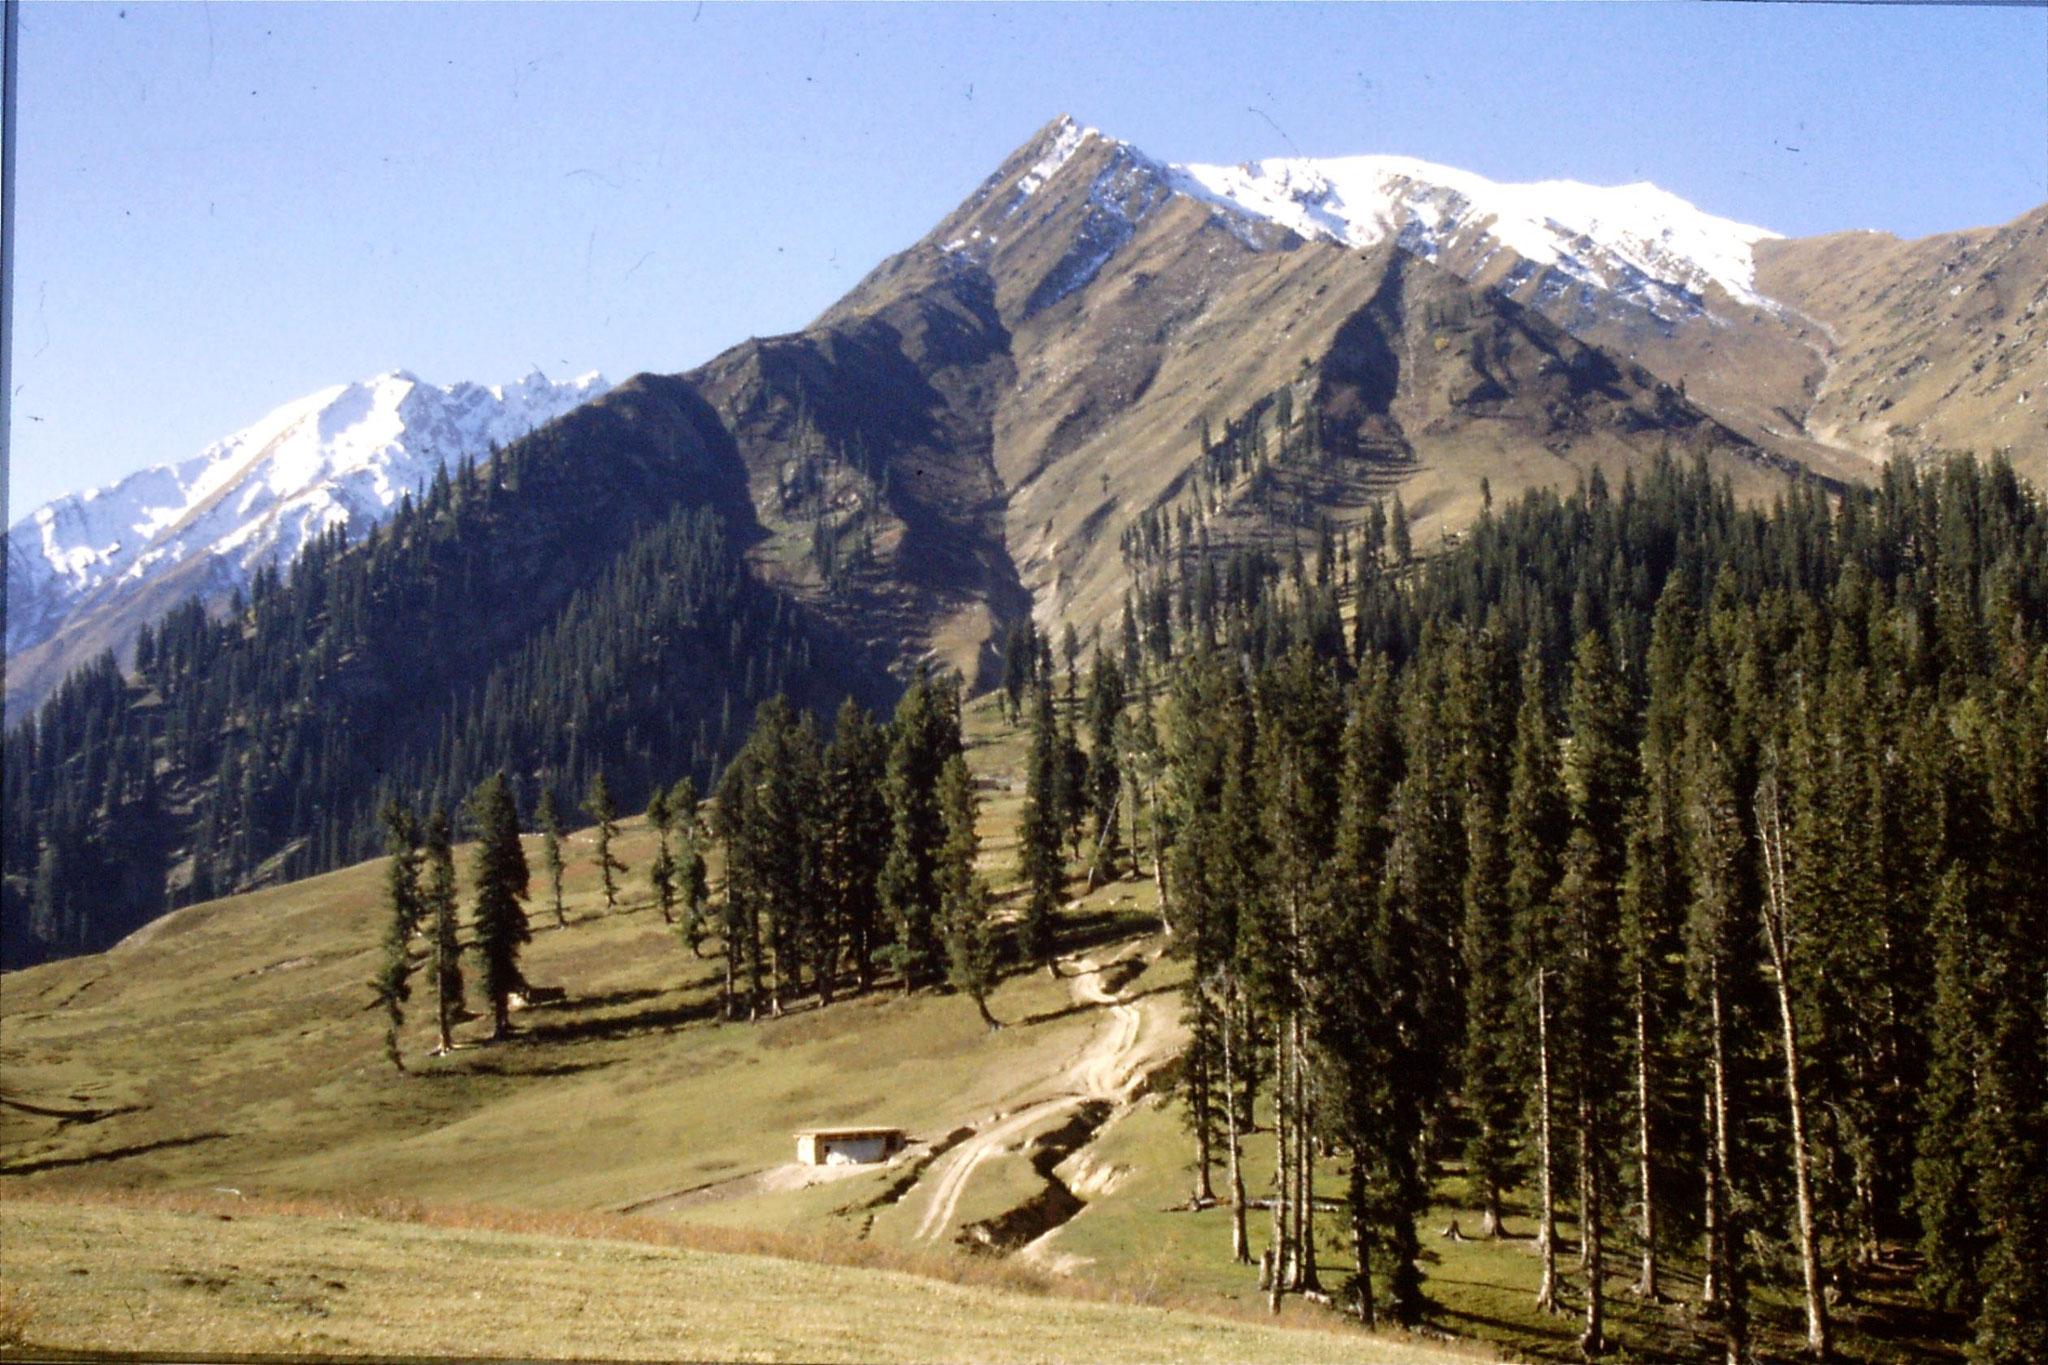 6/10/1989: 20: Lalazar pastures